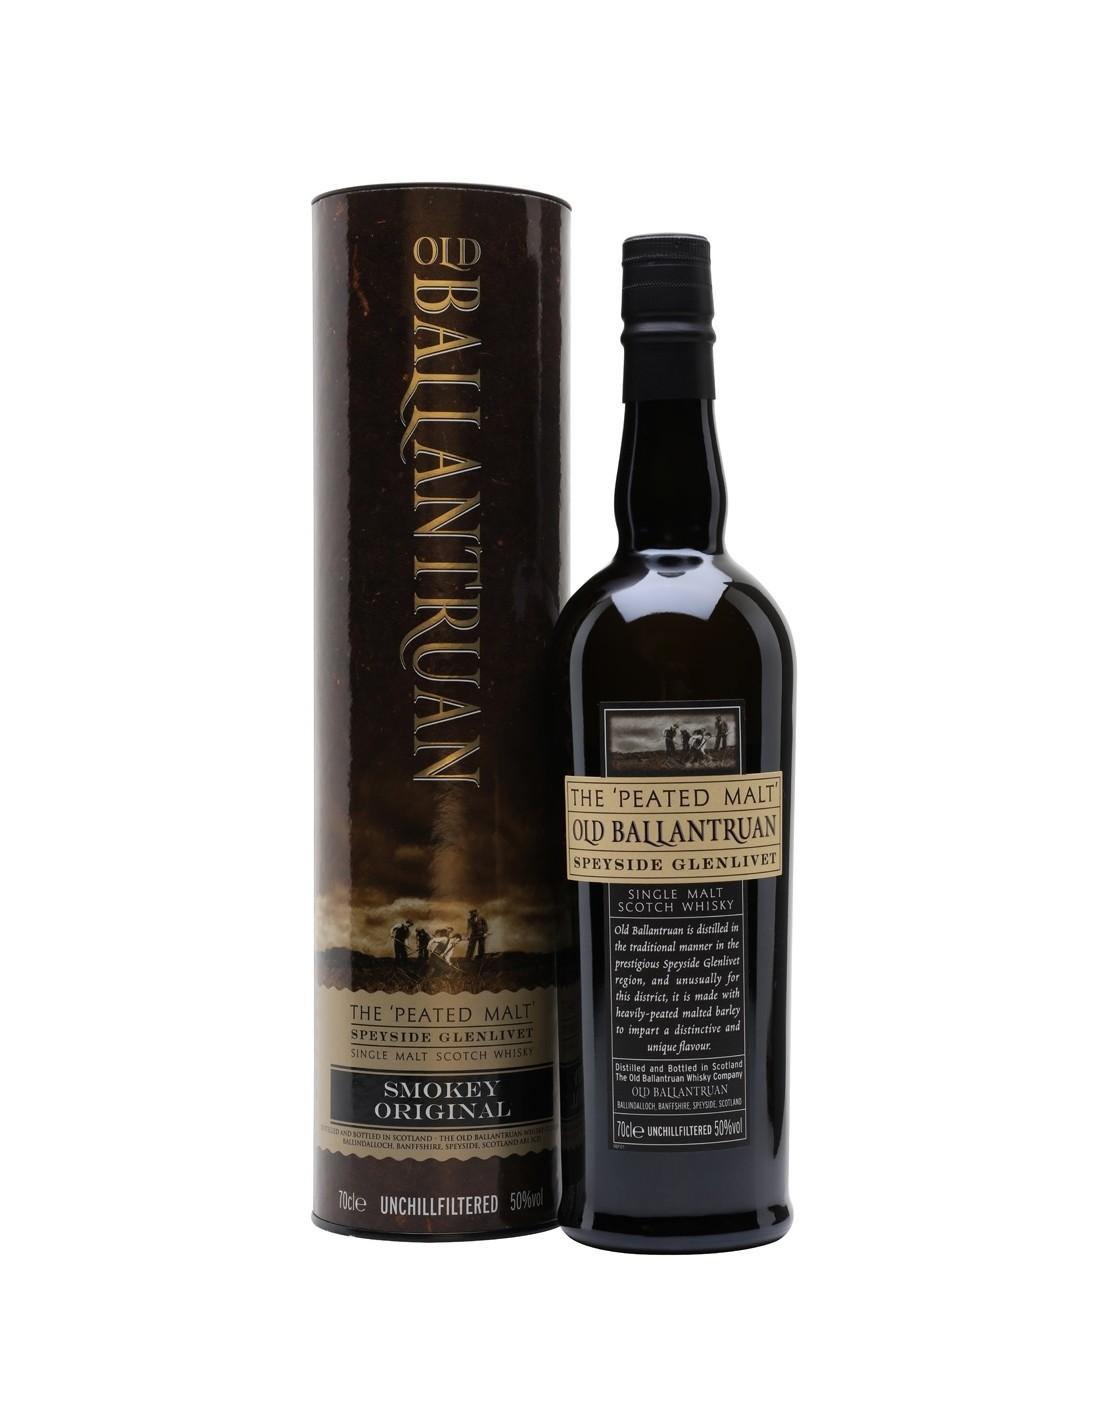 Whisky Old Ballantruan Smokey Original, 0.7L, 50% alc., Scotia